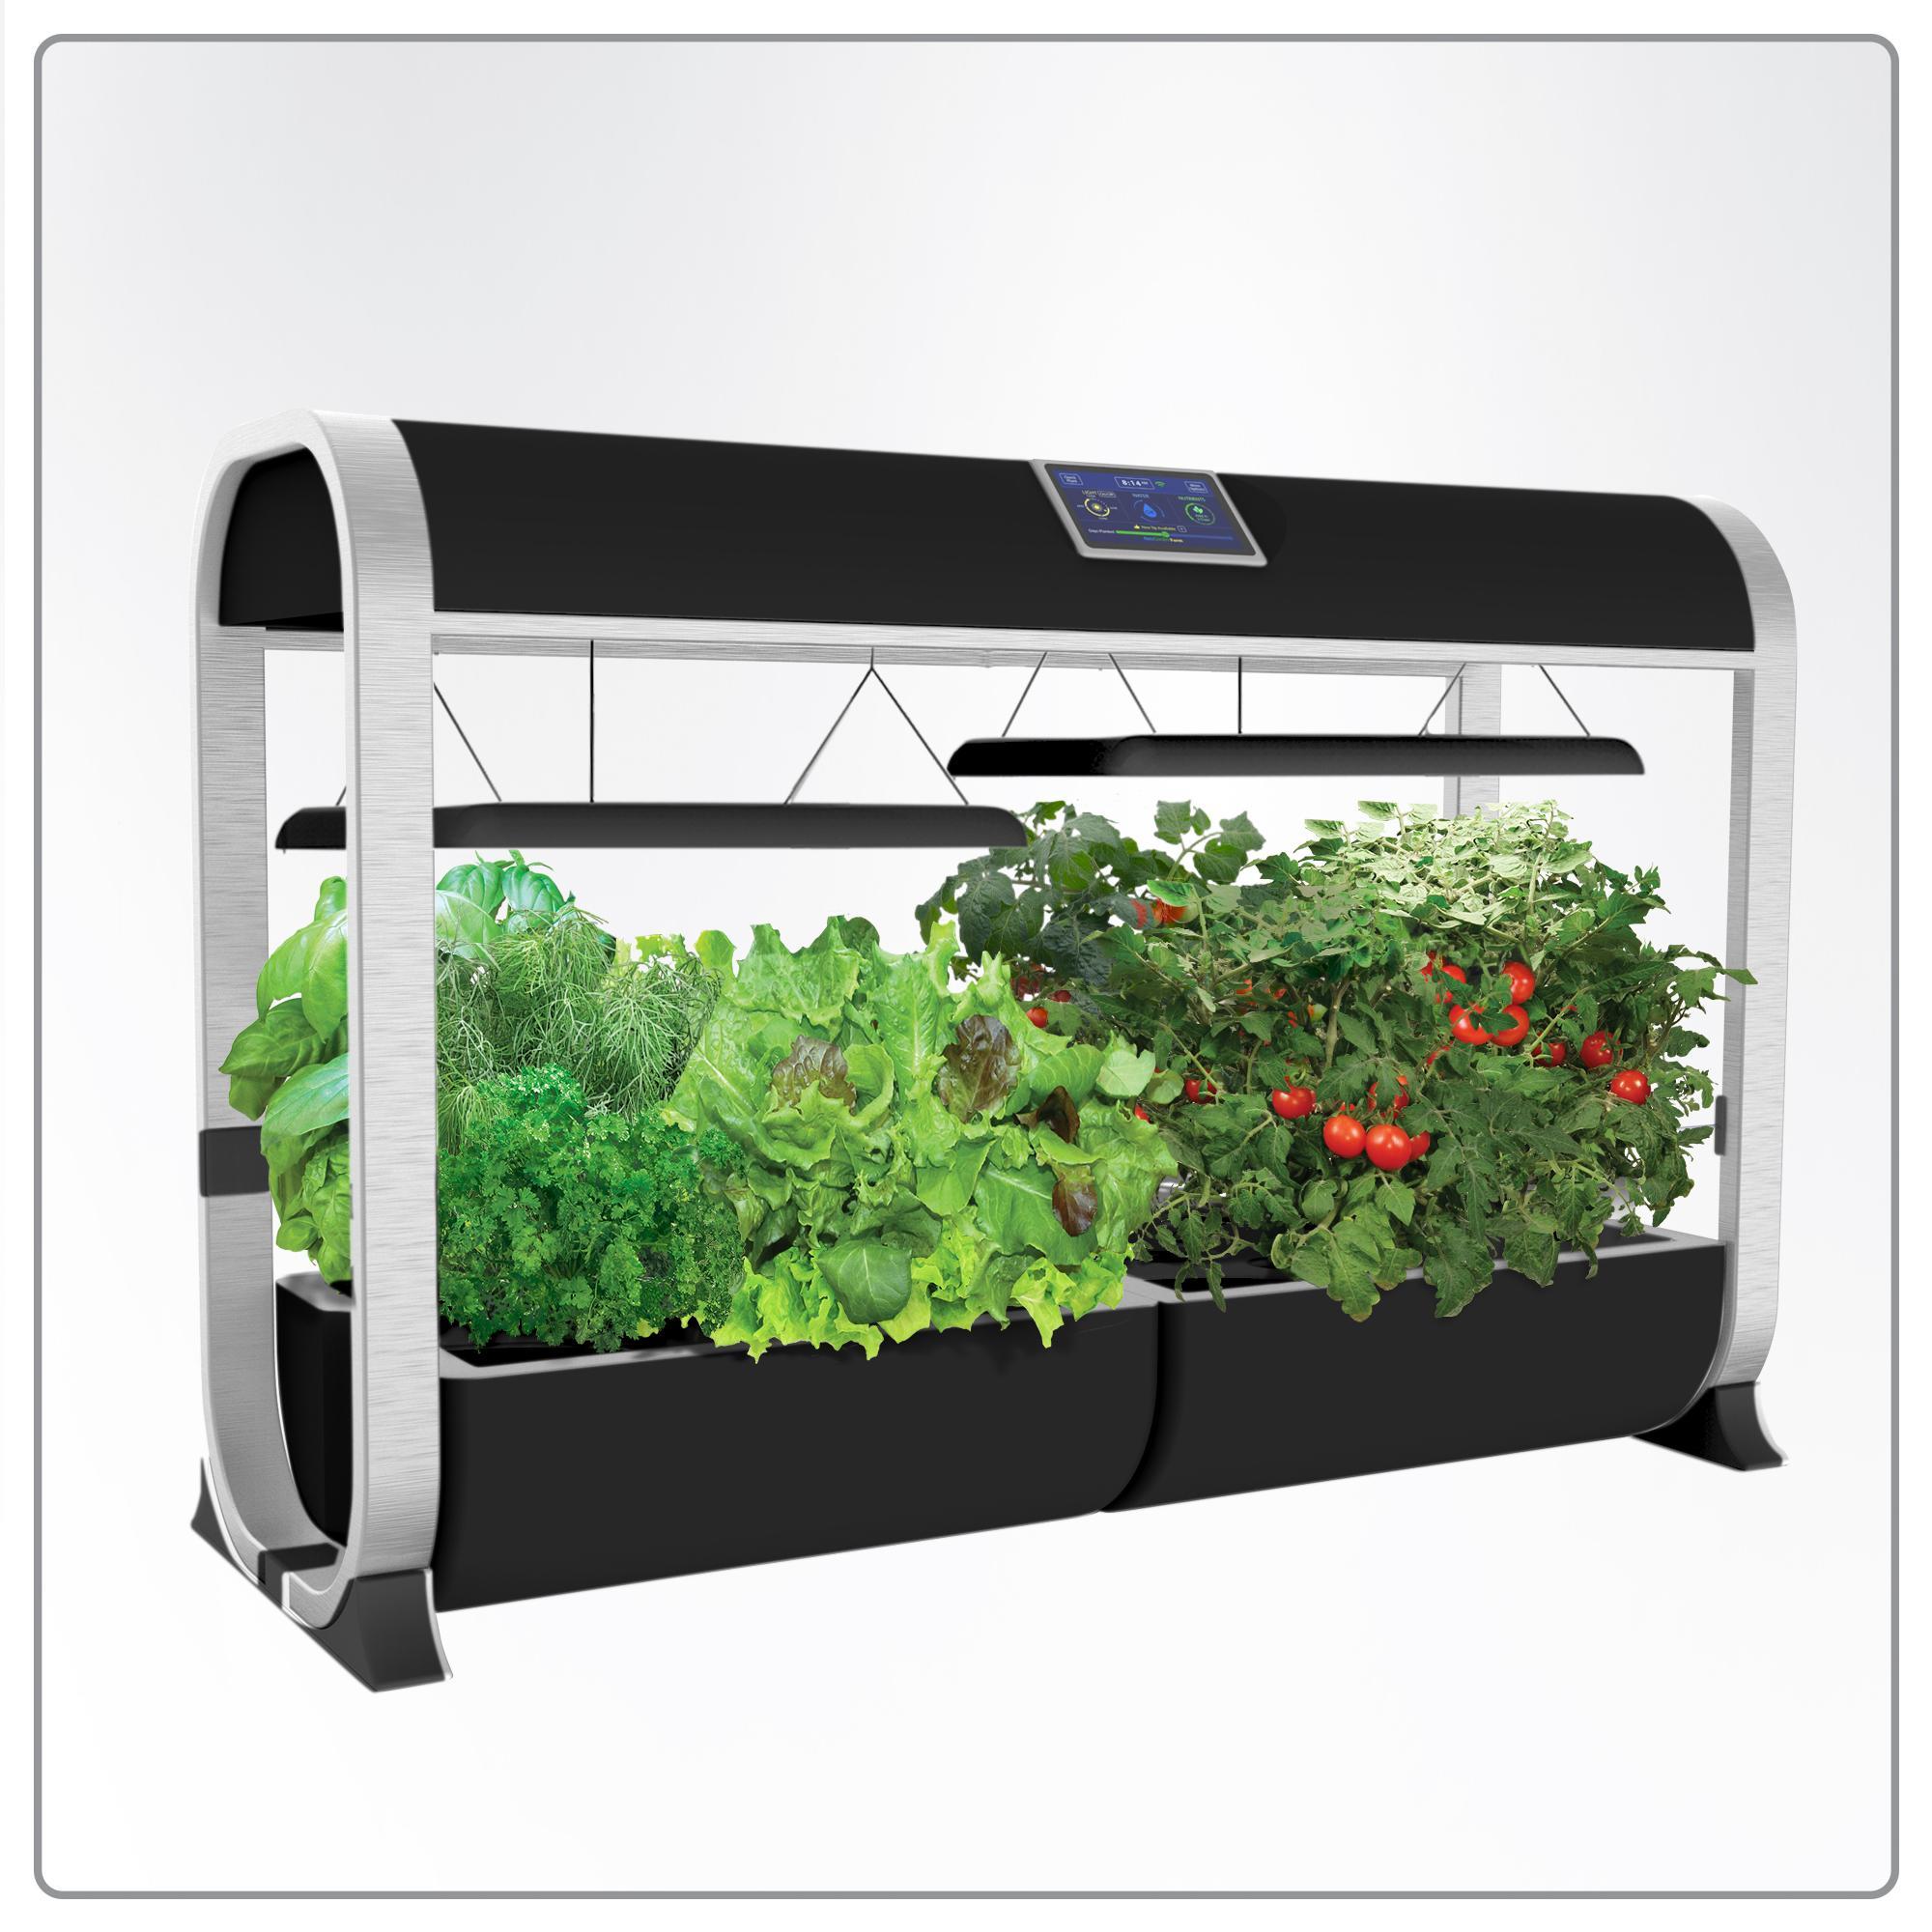 "AeroGarden Farm Germination Equipment, 12"" Grow Height ..."